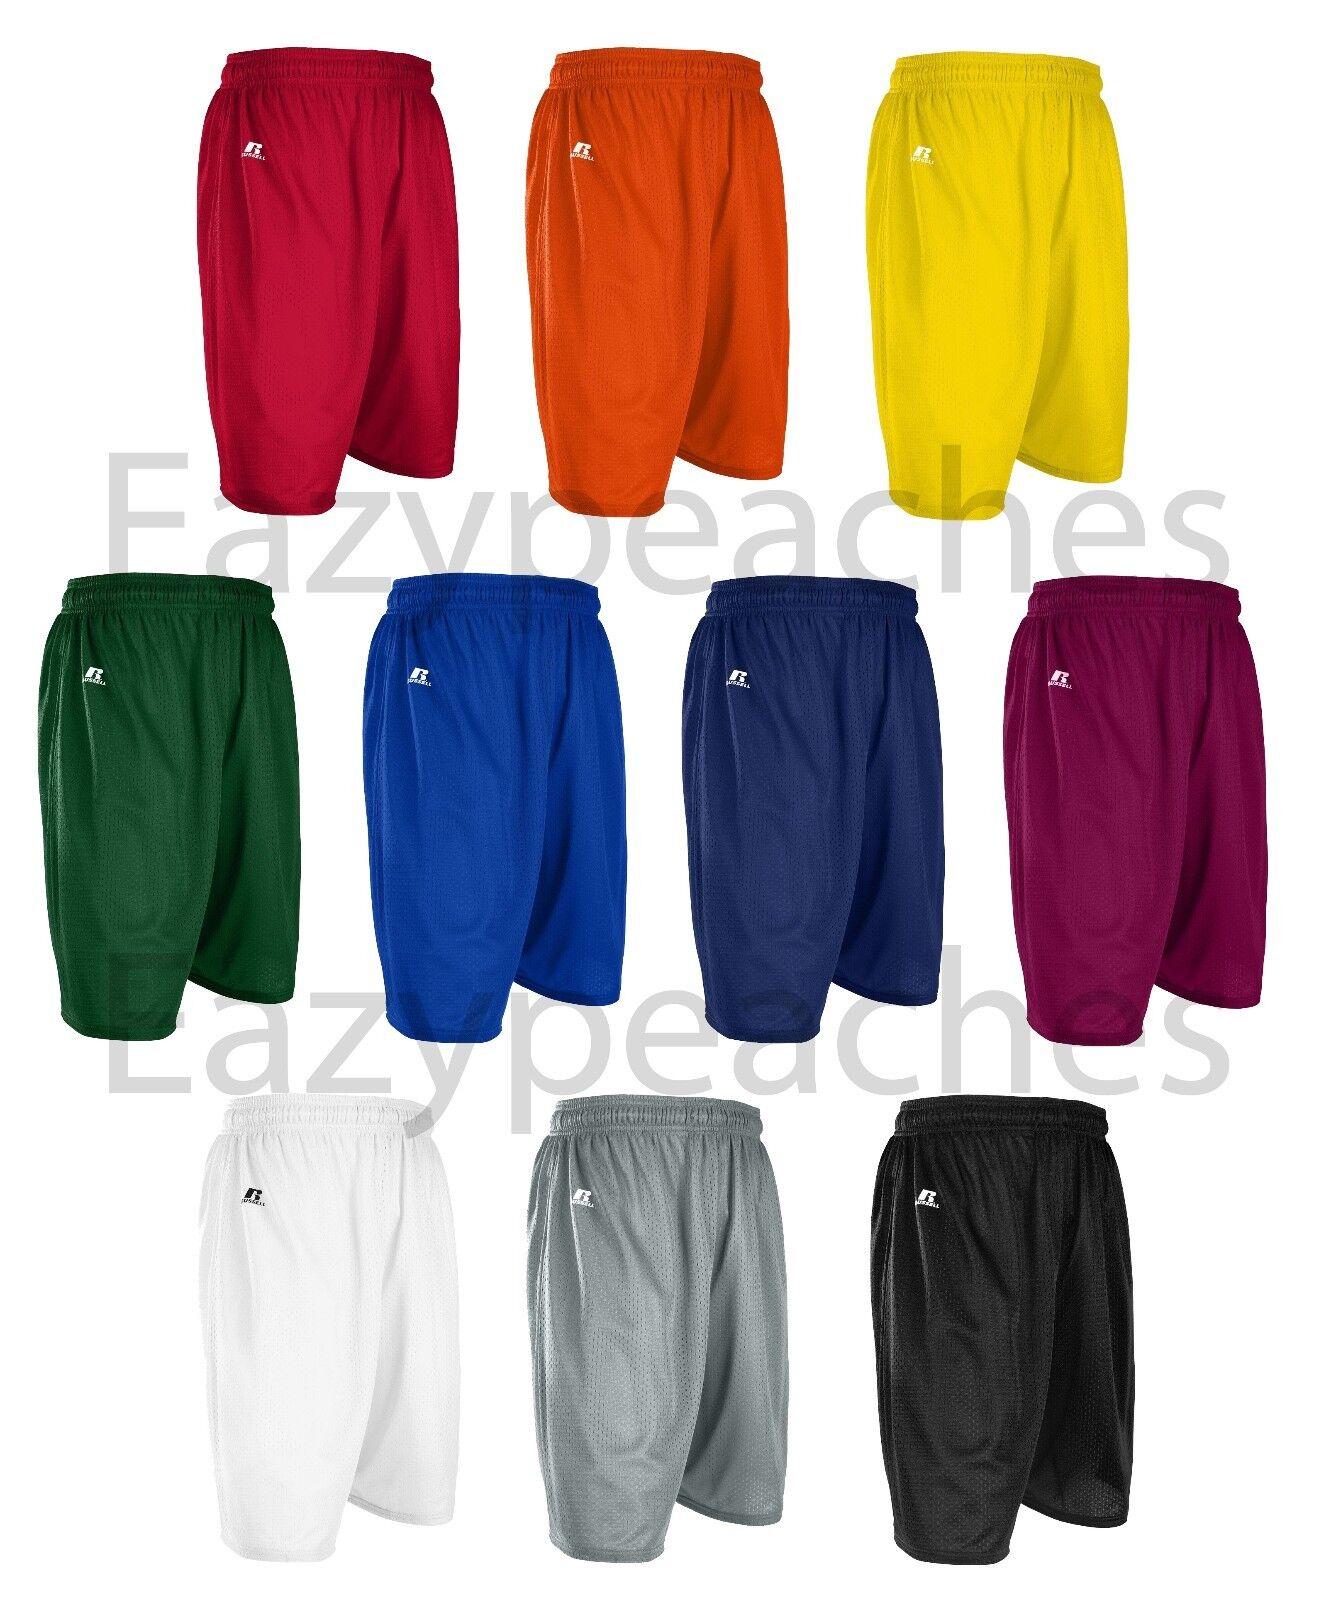 Russell Athletic - Men's S-XL 2X 3XL Mesh Shorts Gym, Basket